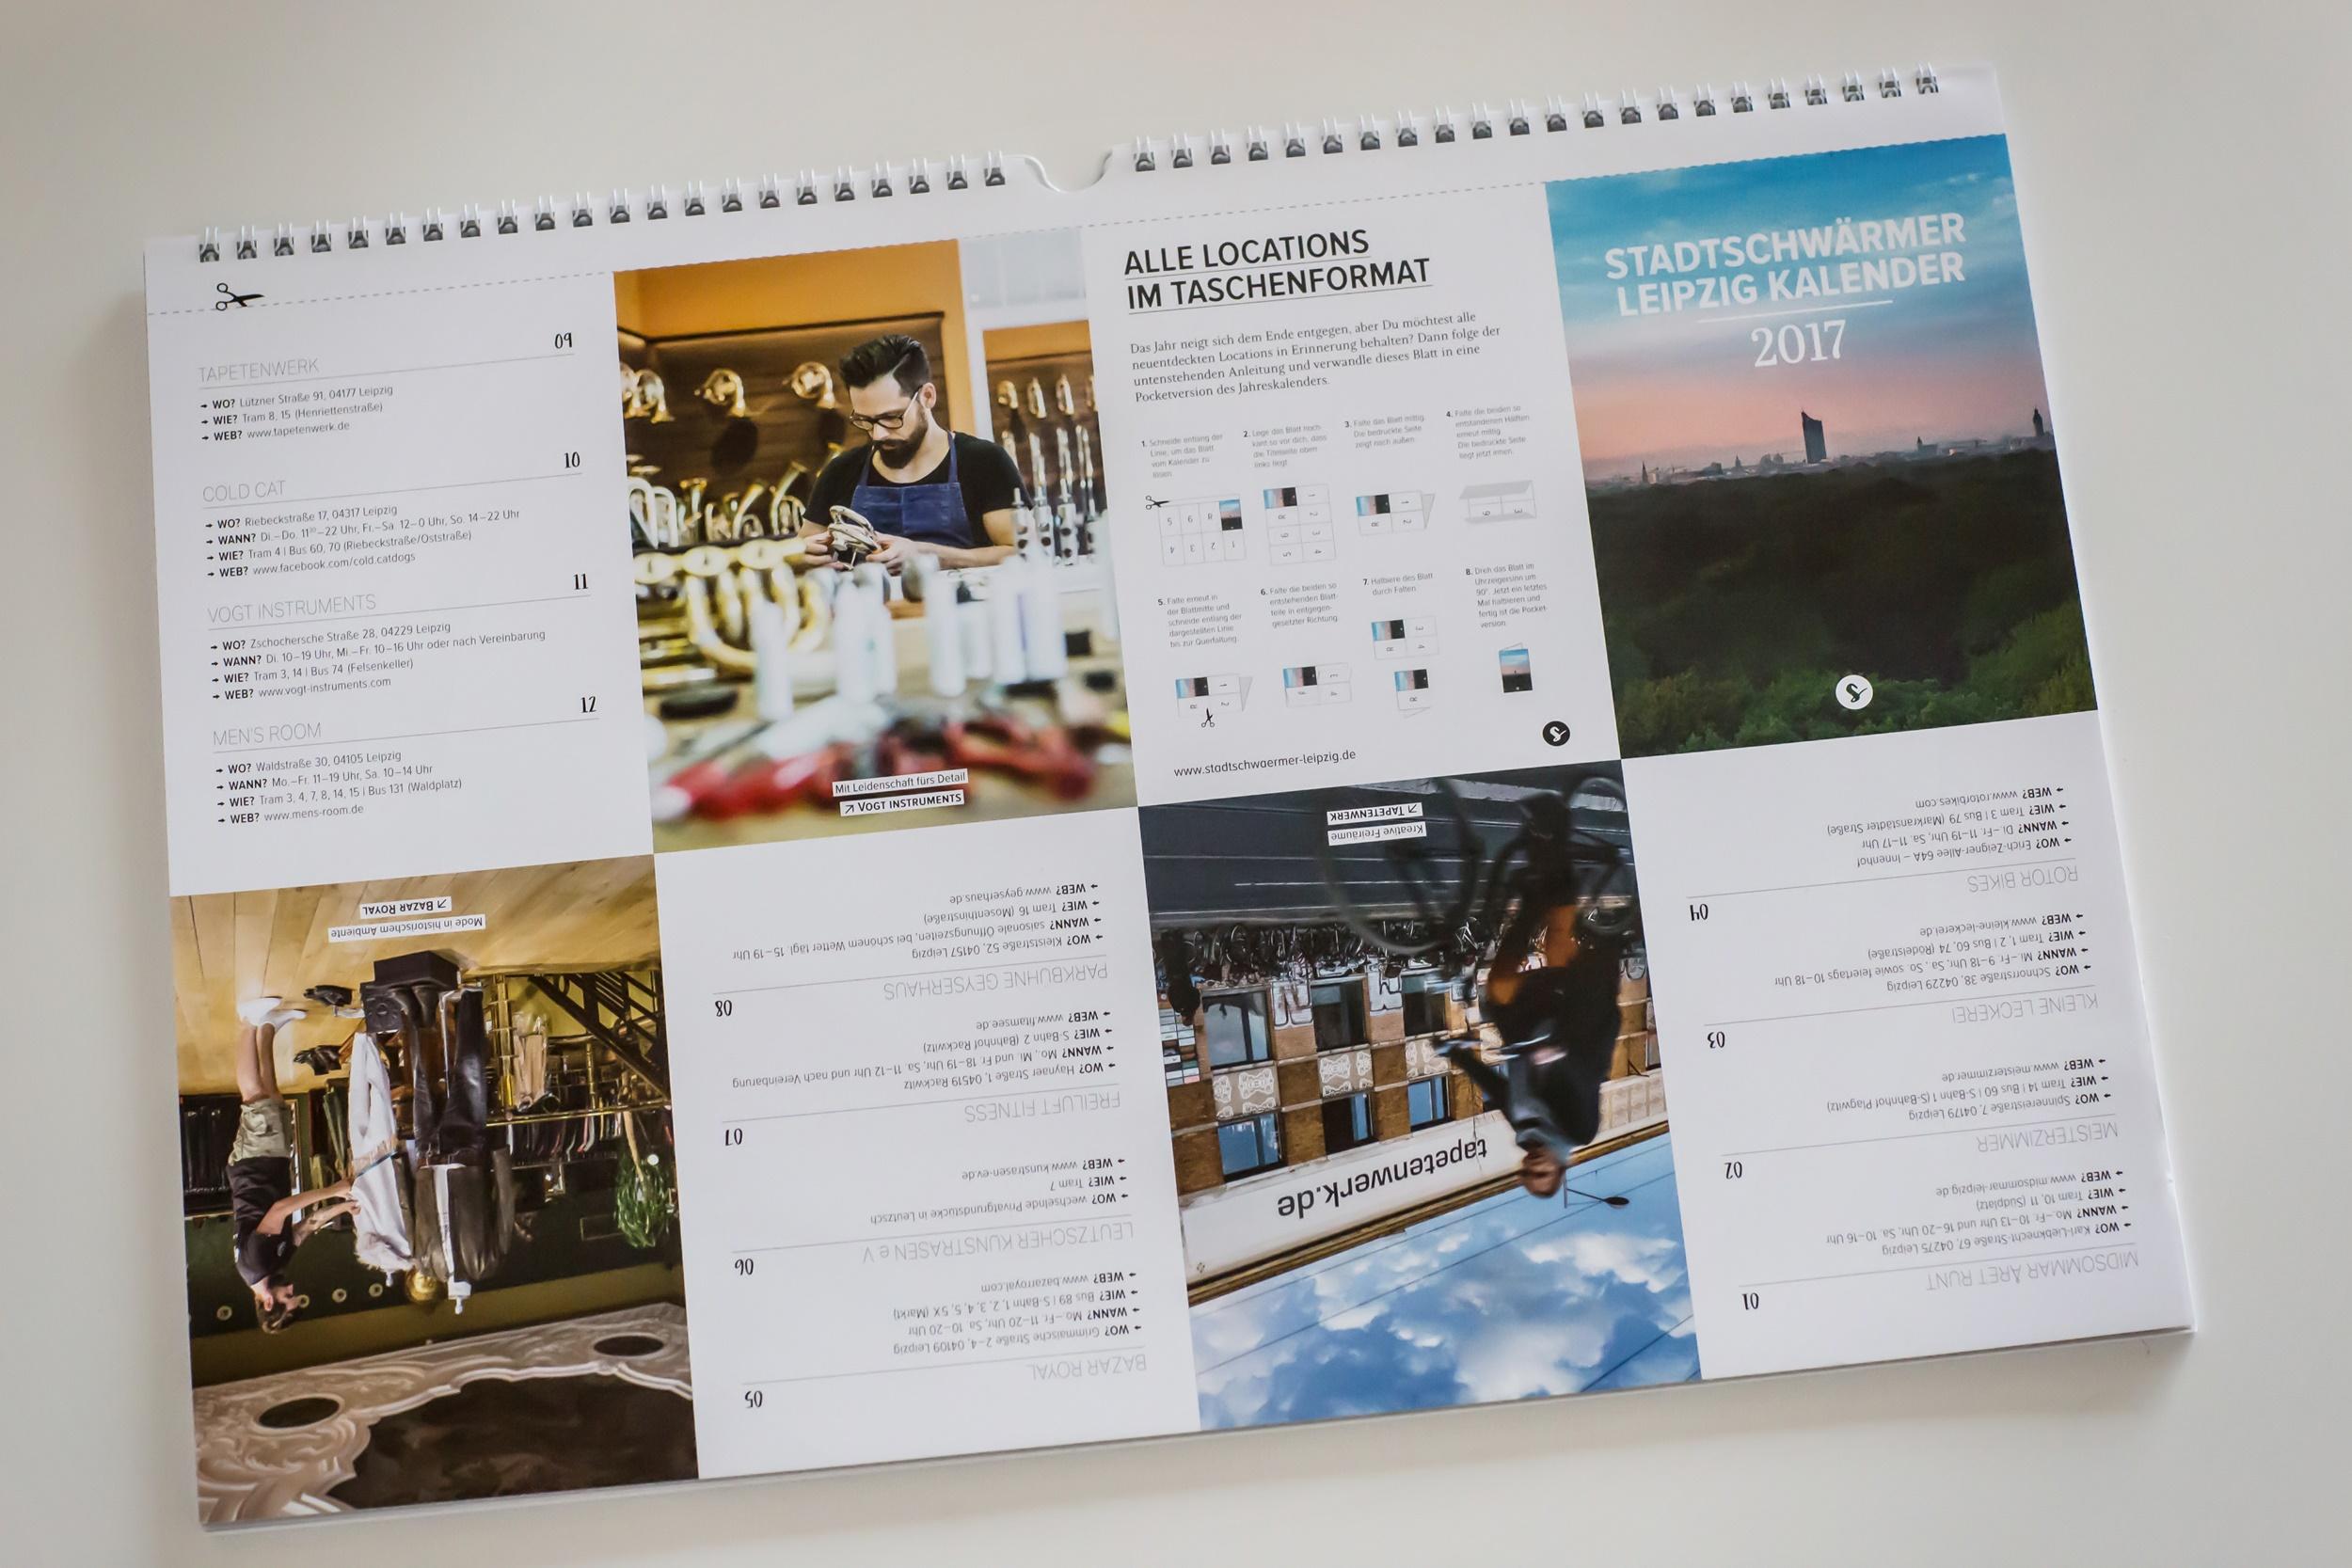 stadtschwaermer-leipzig-kalender-2017_18